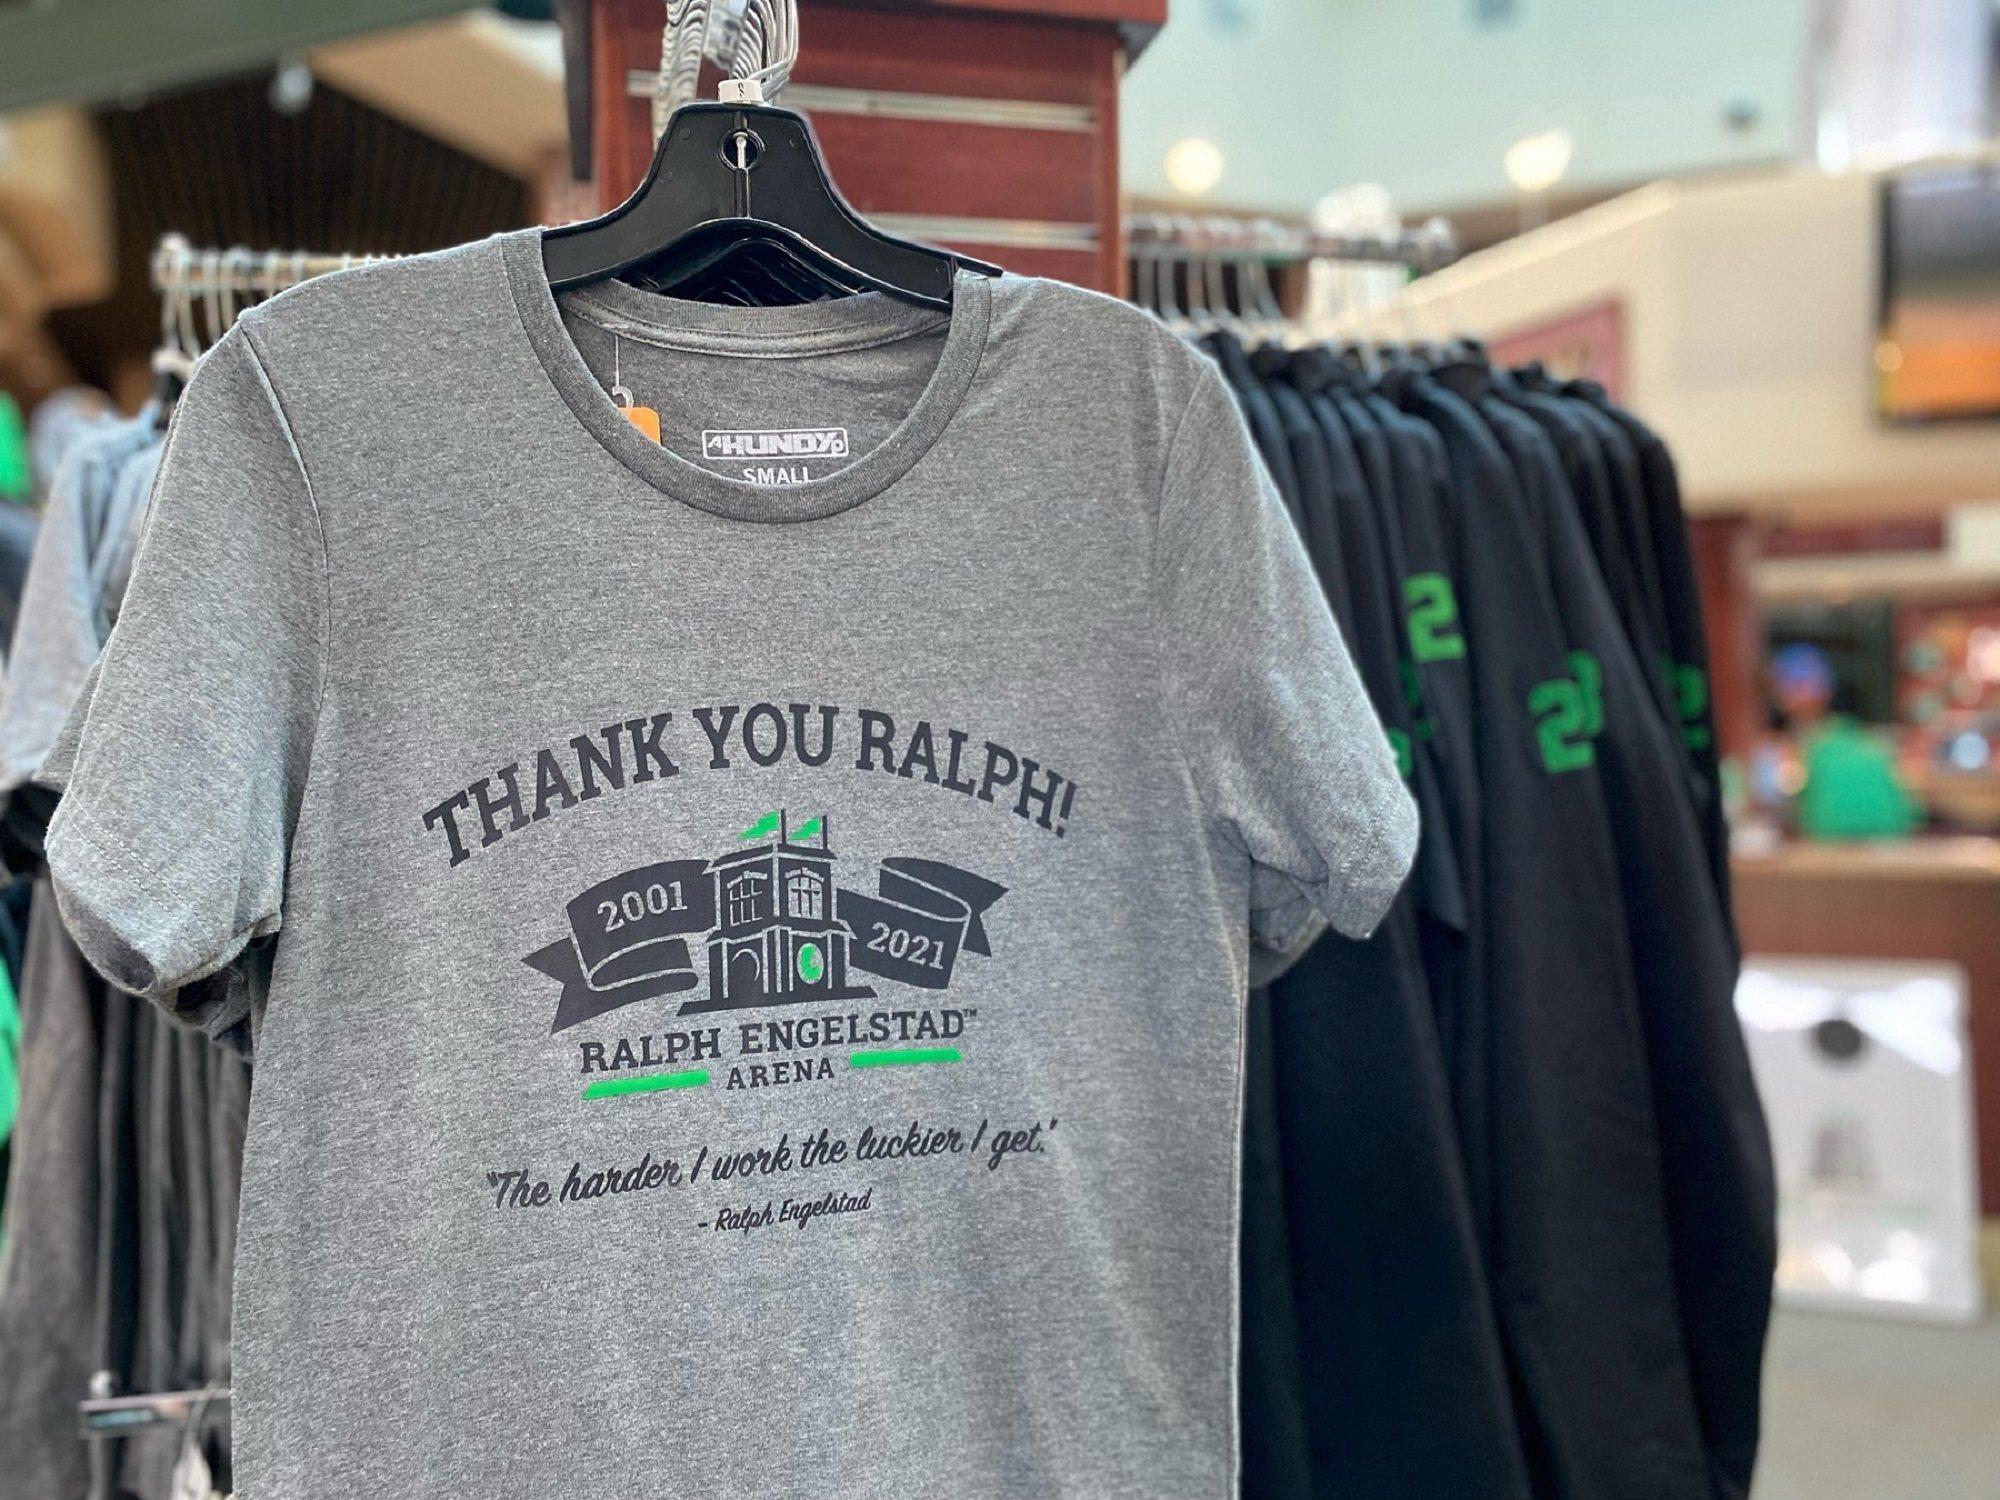 Thank You Ralph!